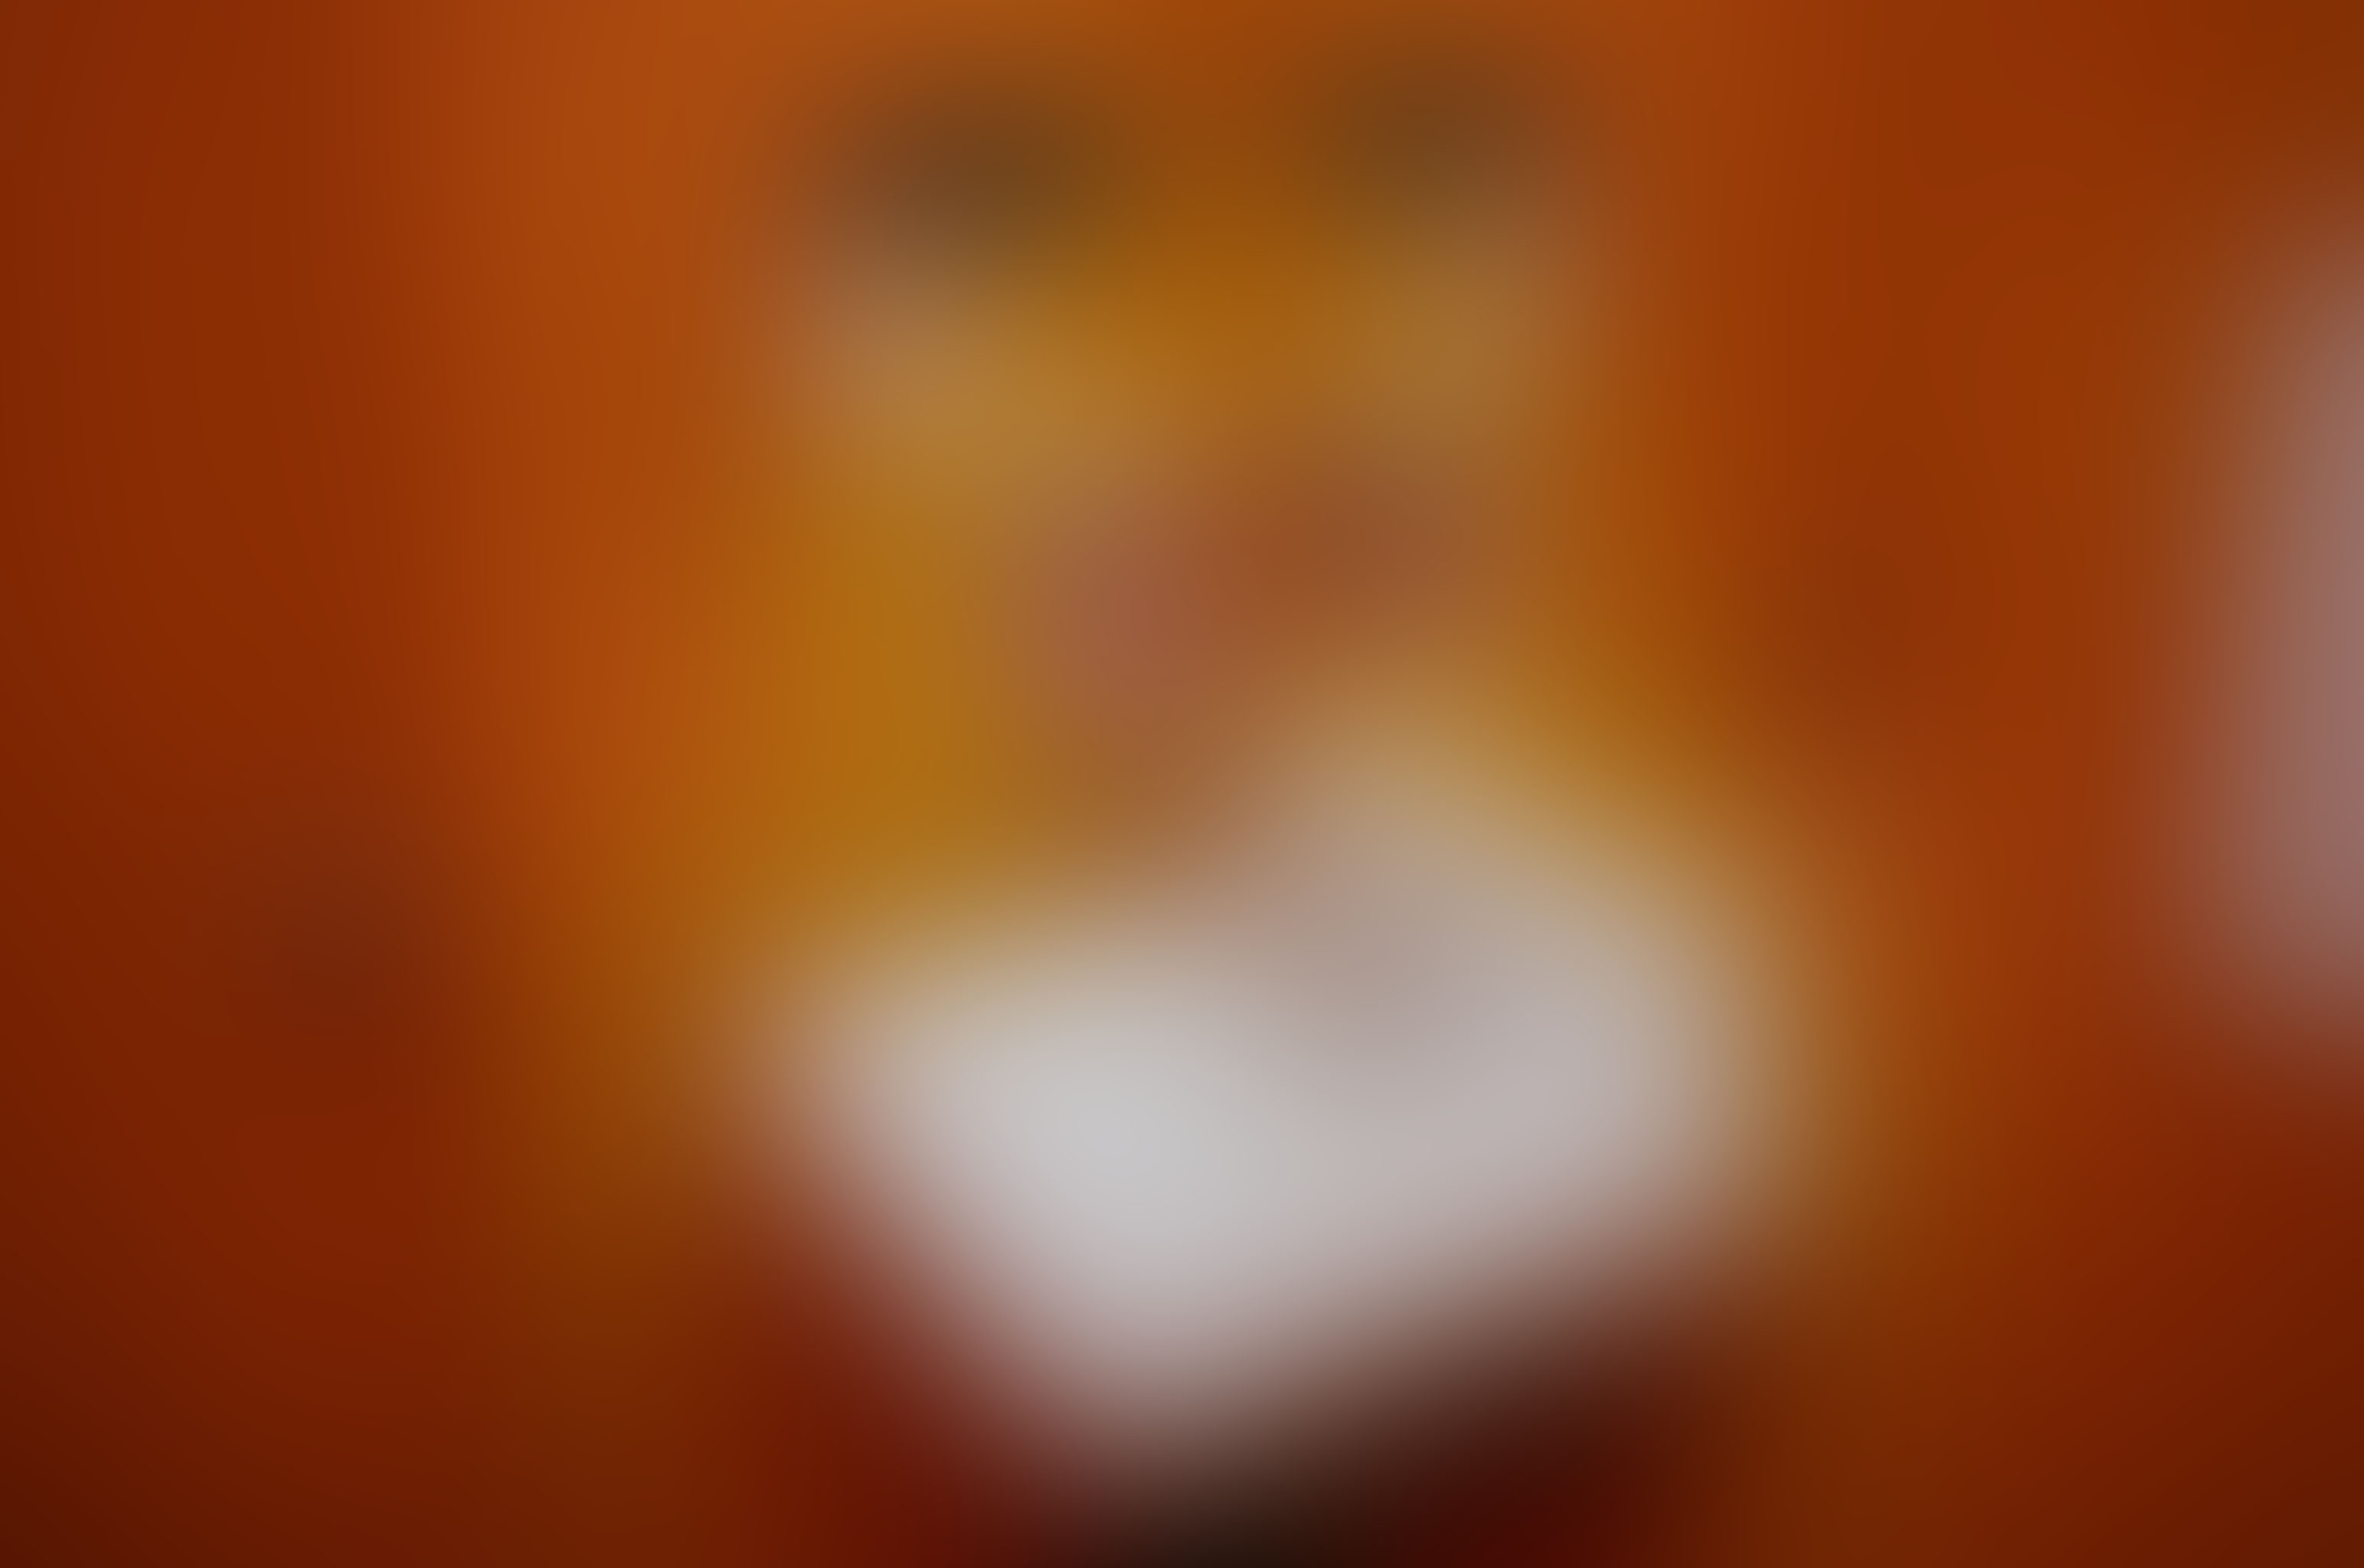 Colors-14 orange blur.jpg